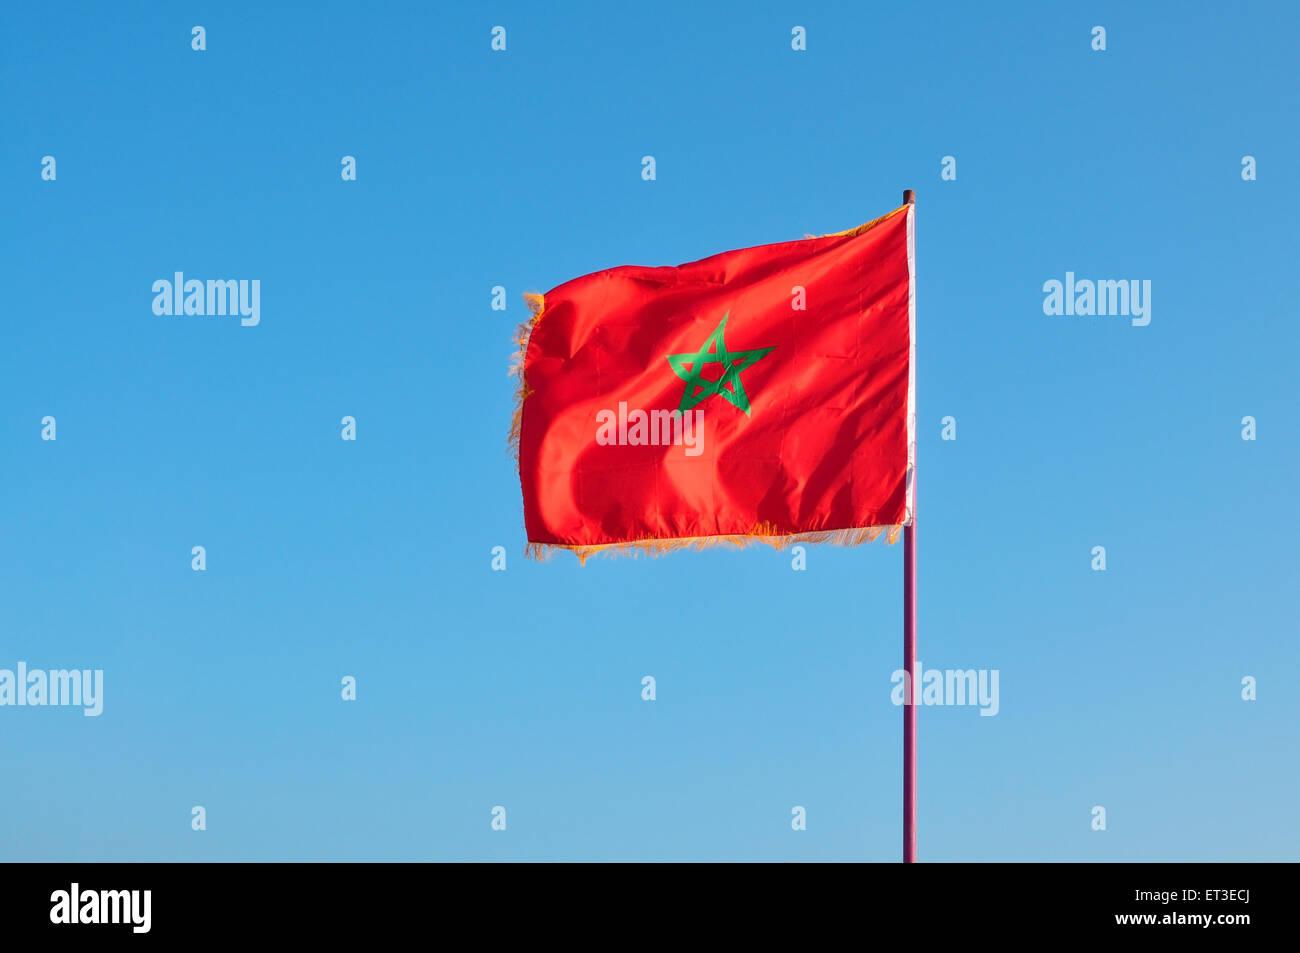 morocco national symbol pole flag waving over blue sky - Stock Image